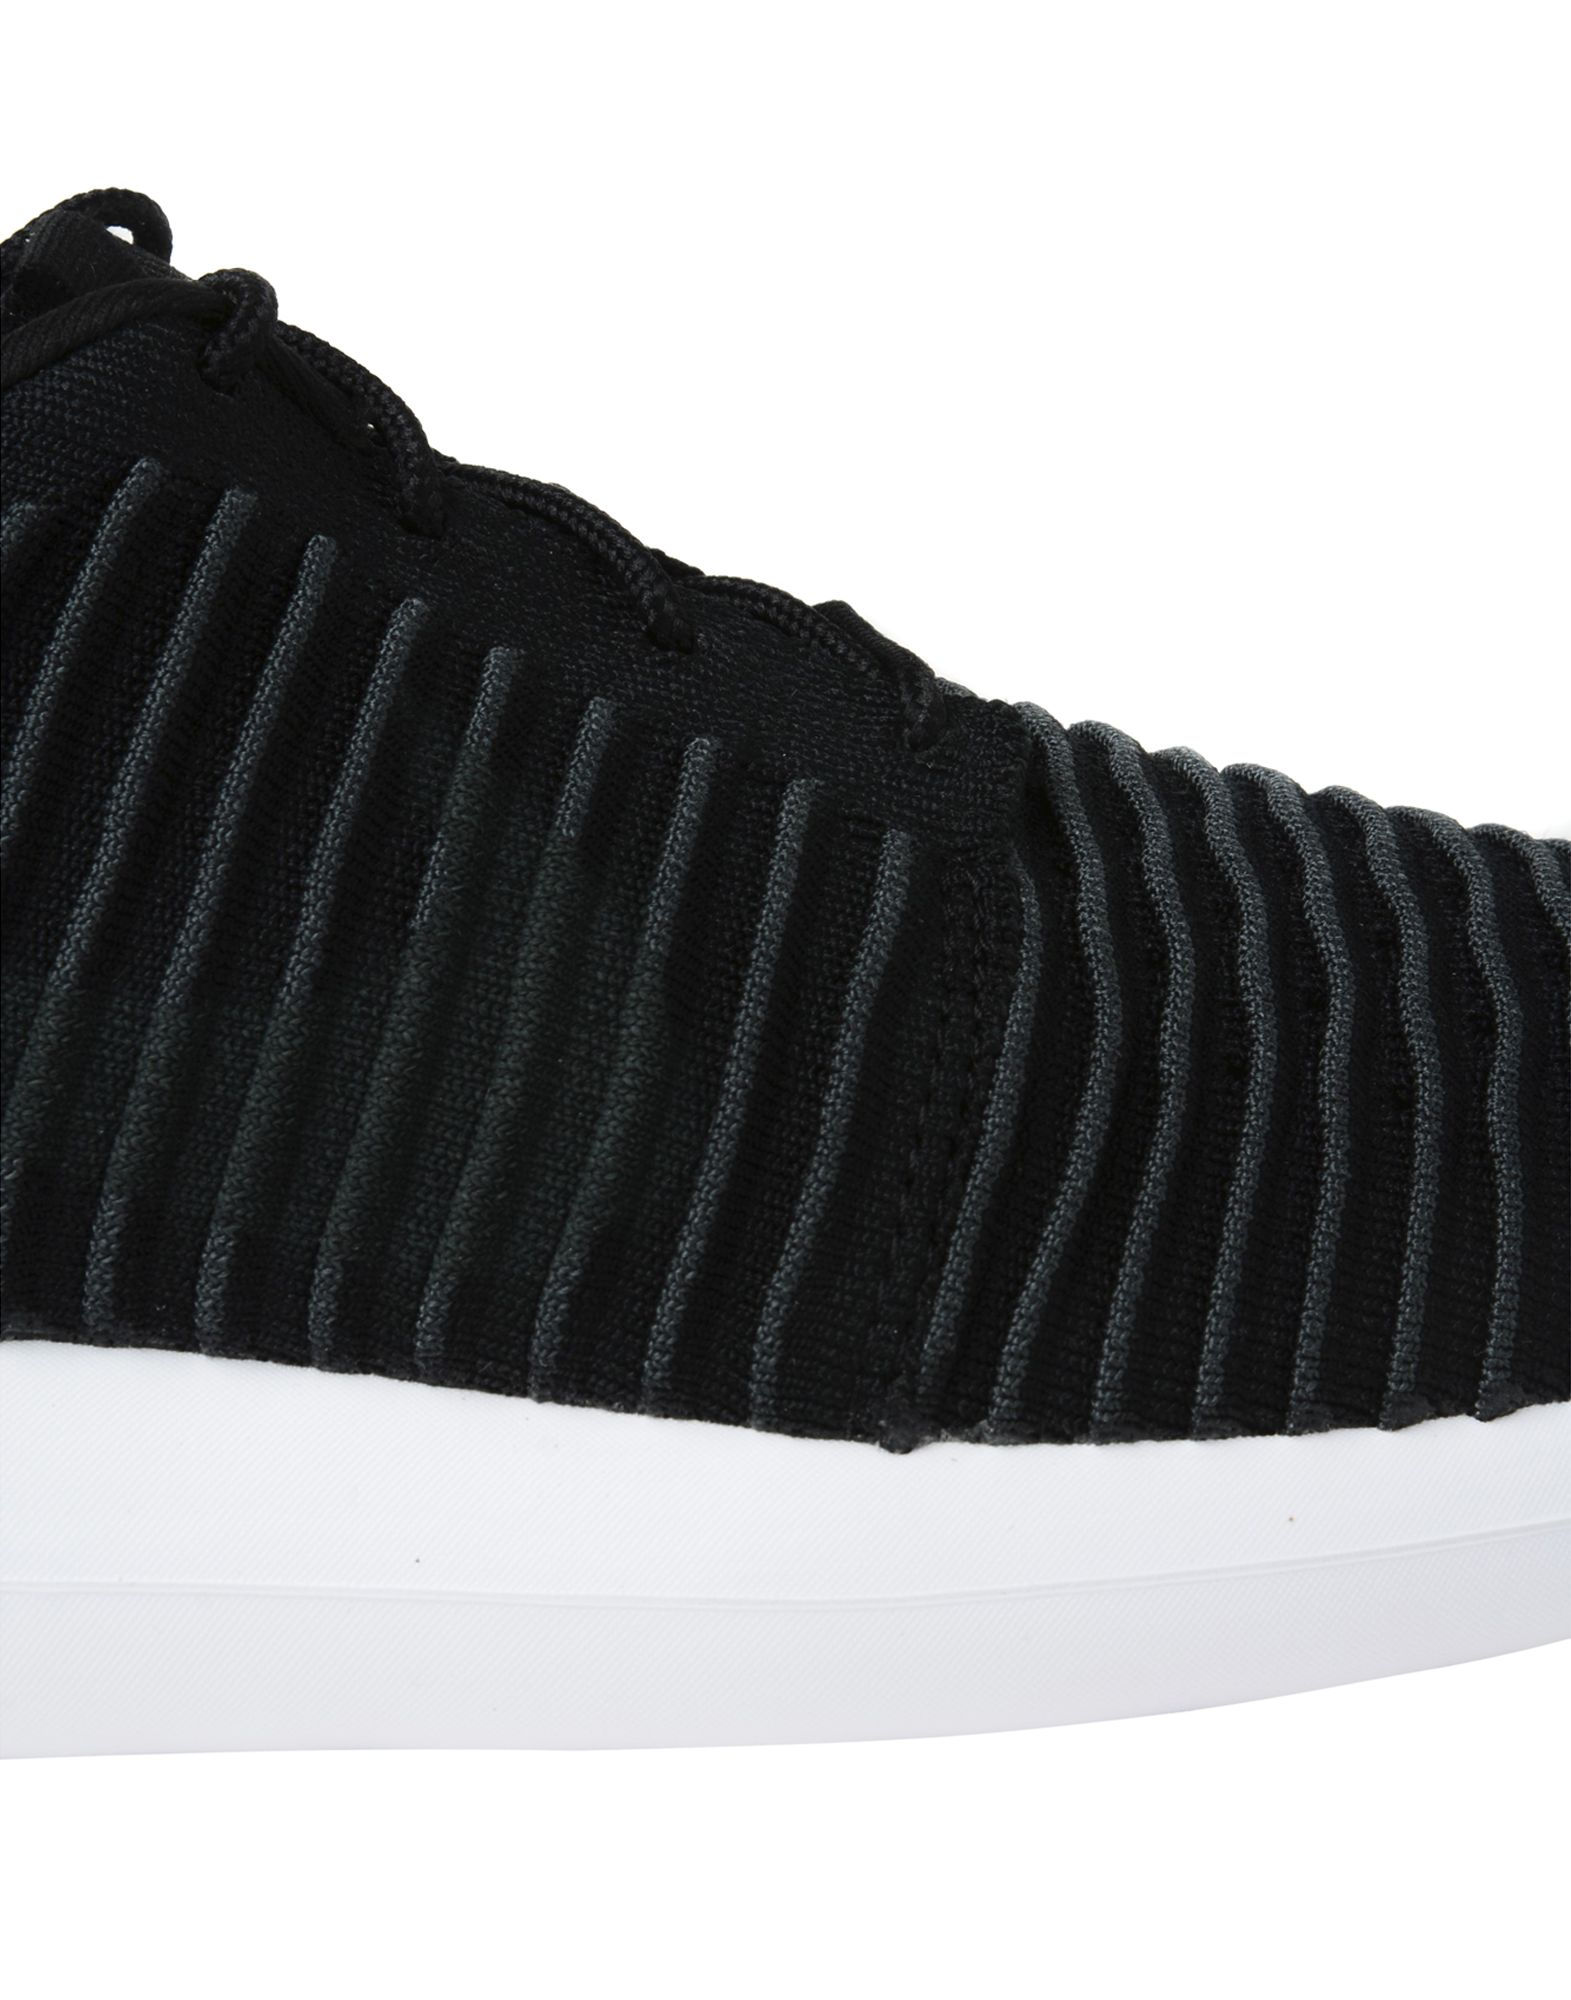 Sneakers Nike  Roshe Two Flyknit - Homme - Sneakers Nike sur